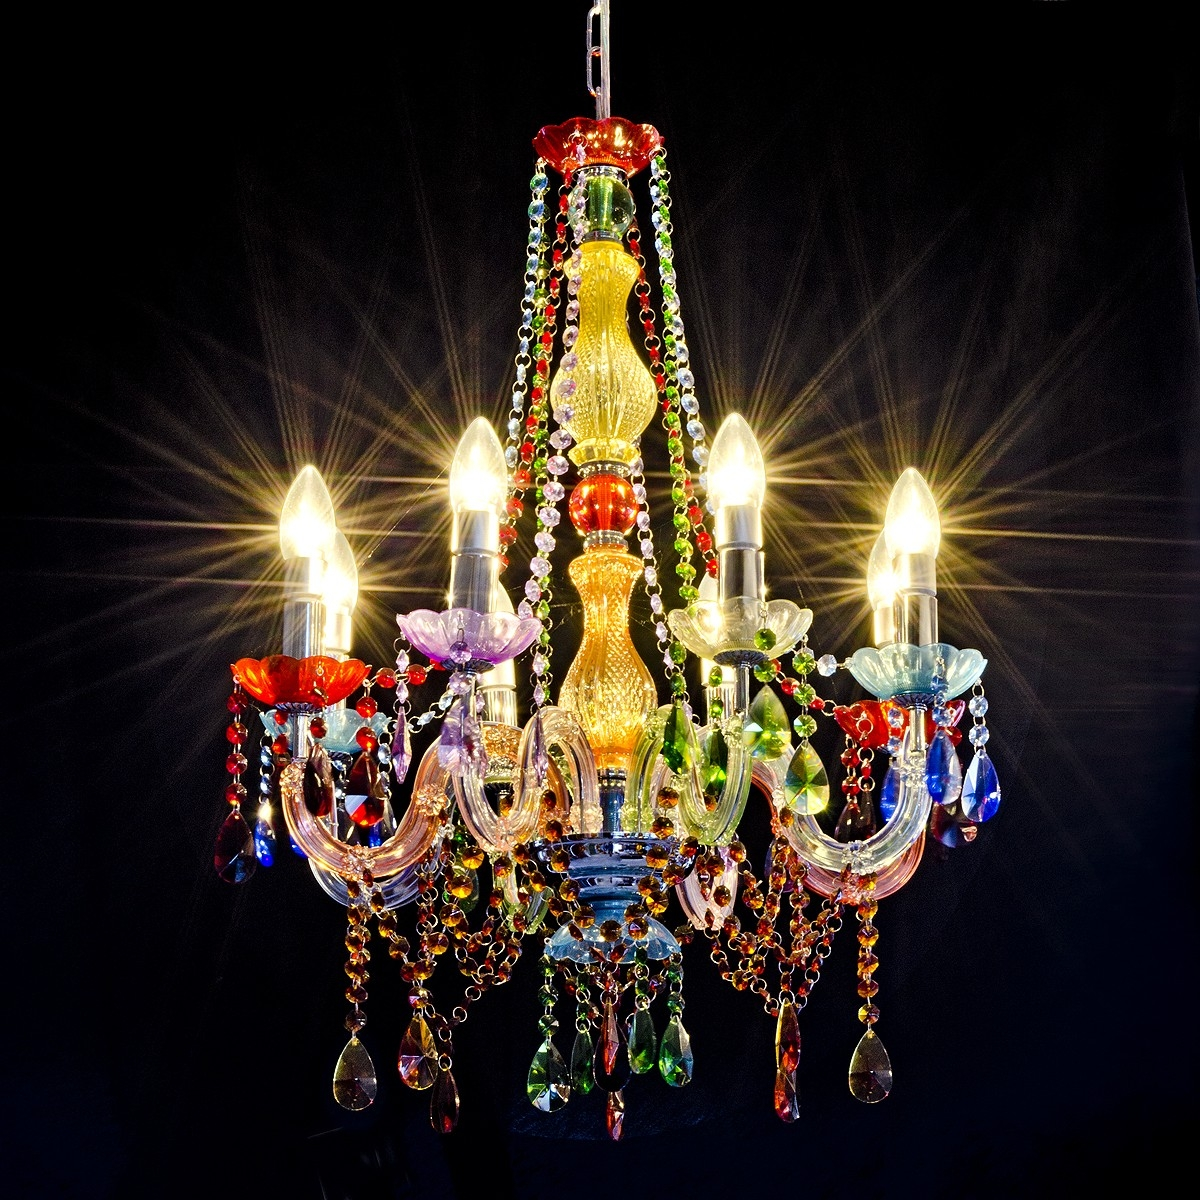 Chandelier Stunning Dining Room Crystal Chandeliers Vintage Inside Coloured Chandeliers (Image 6 of 15)